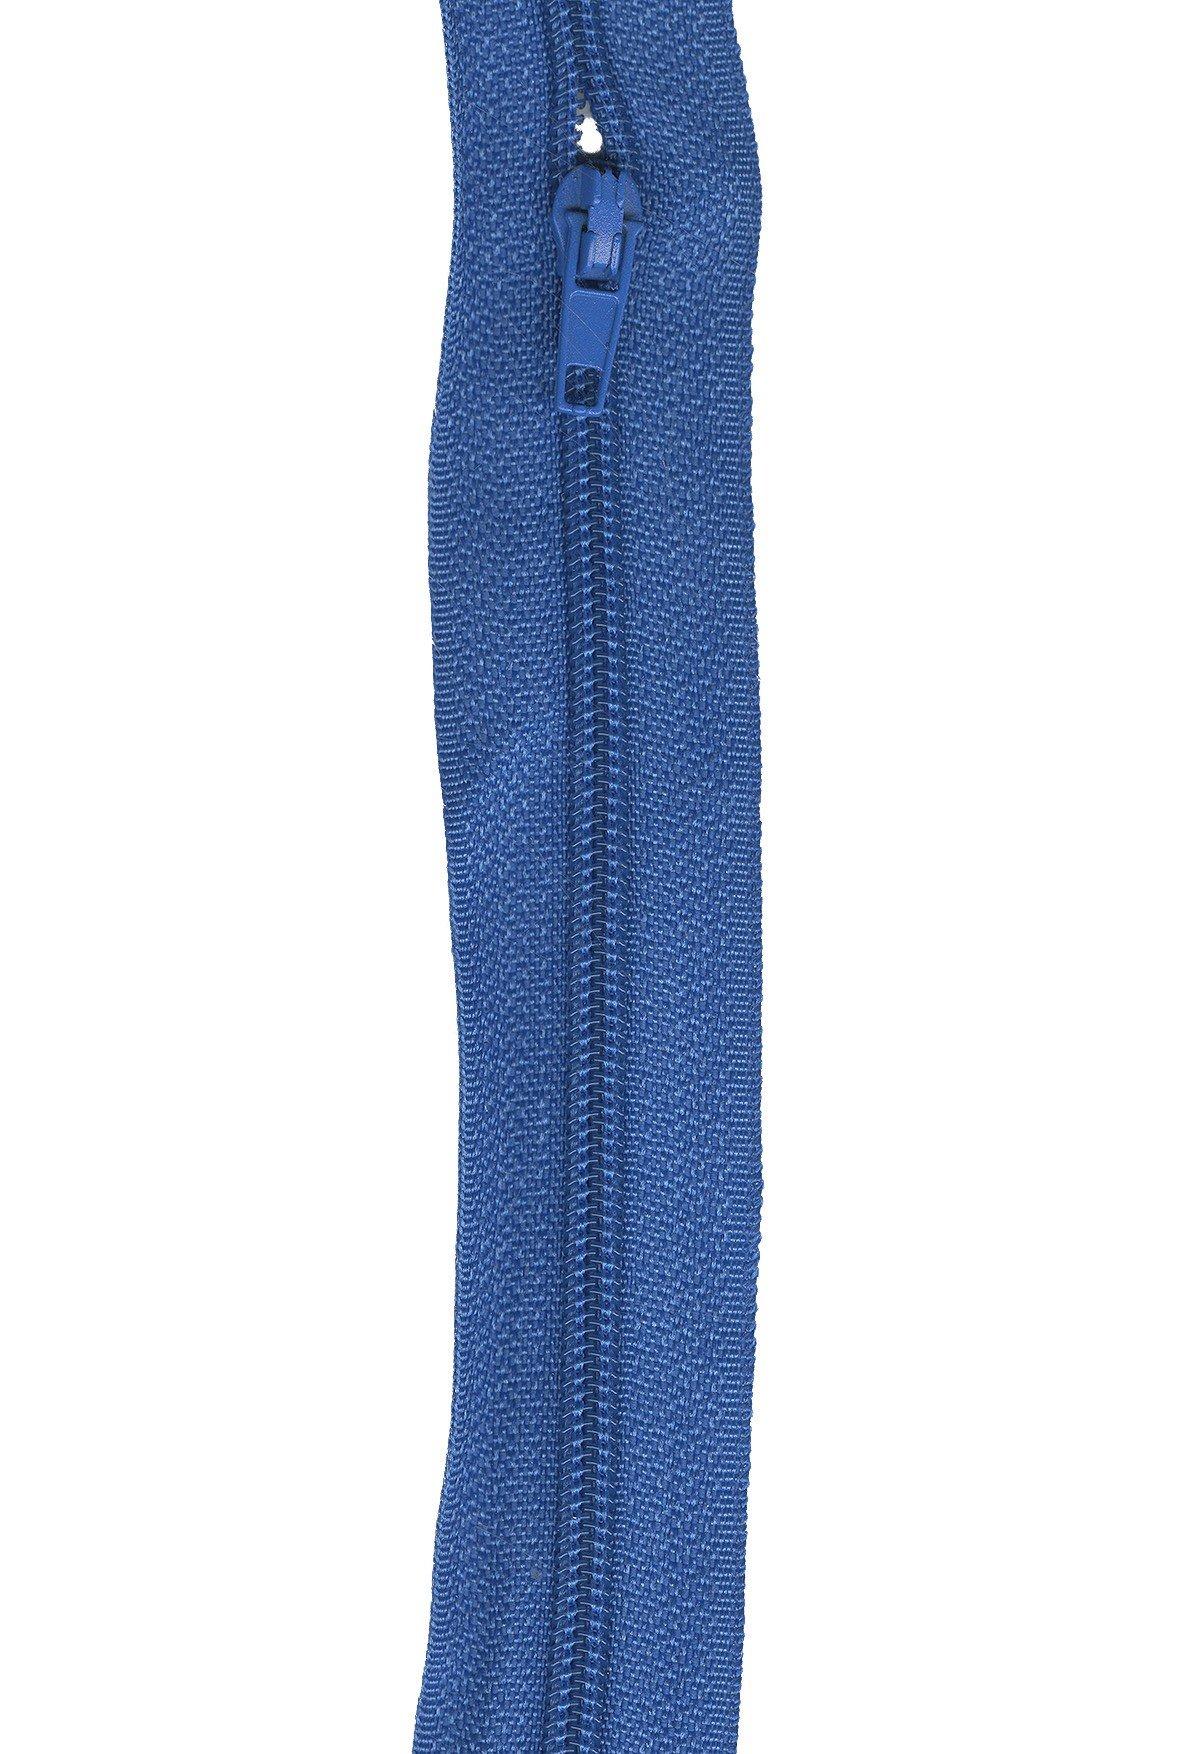 Sullivans Make-A-Zipper Kit, 5-1/2-Yard, Royal Blue